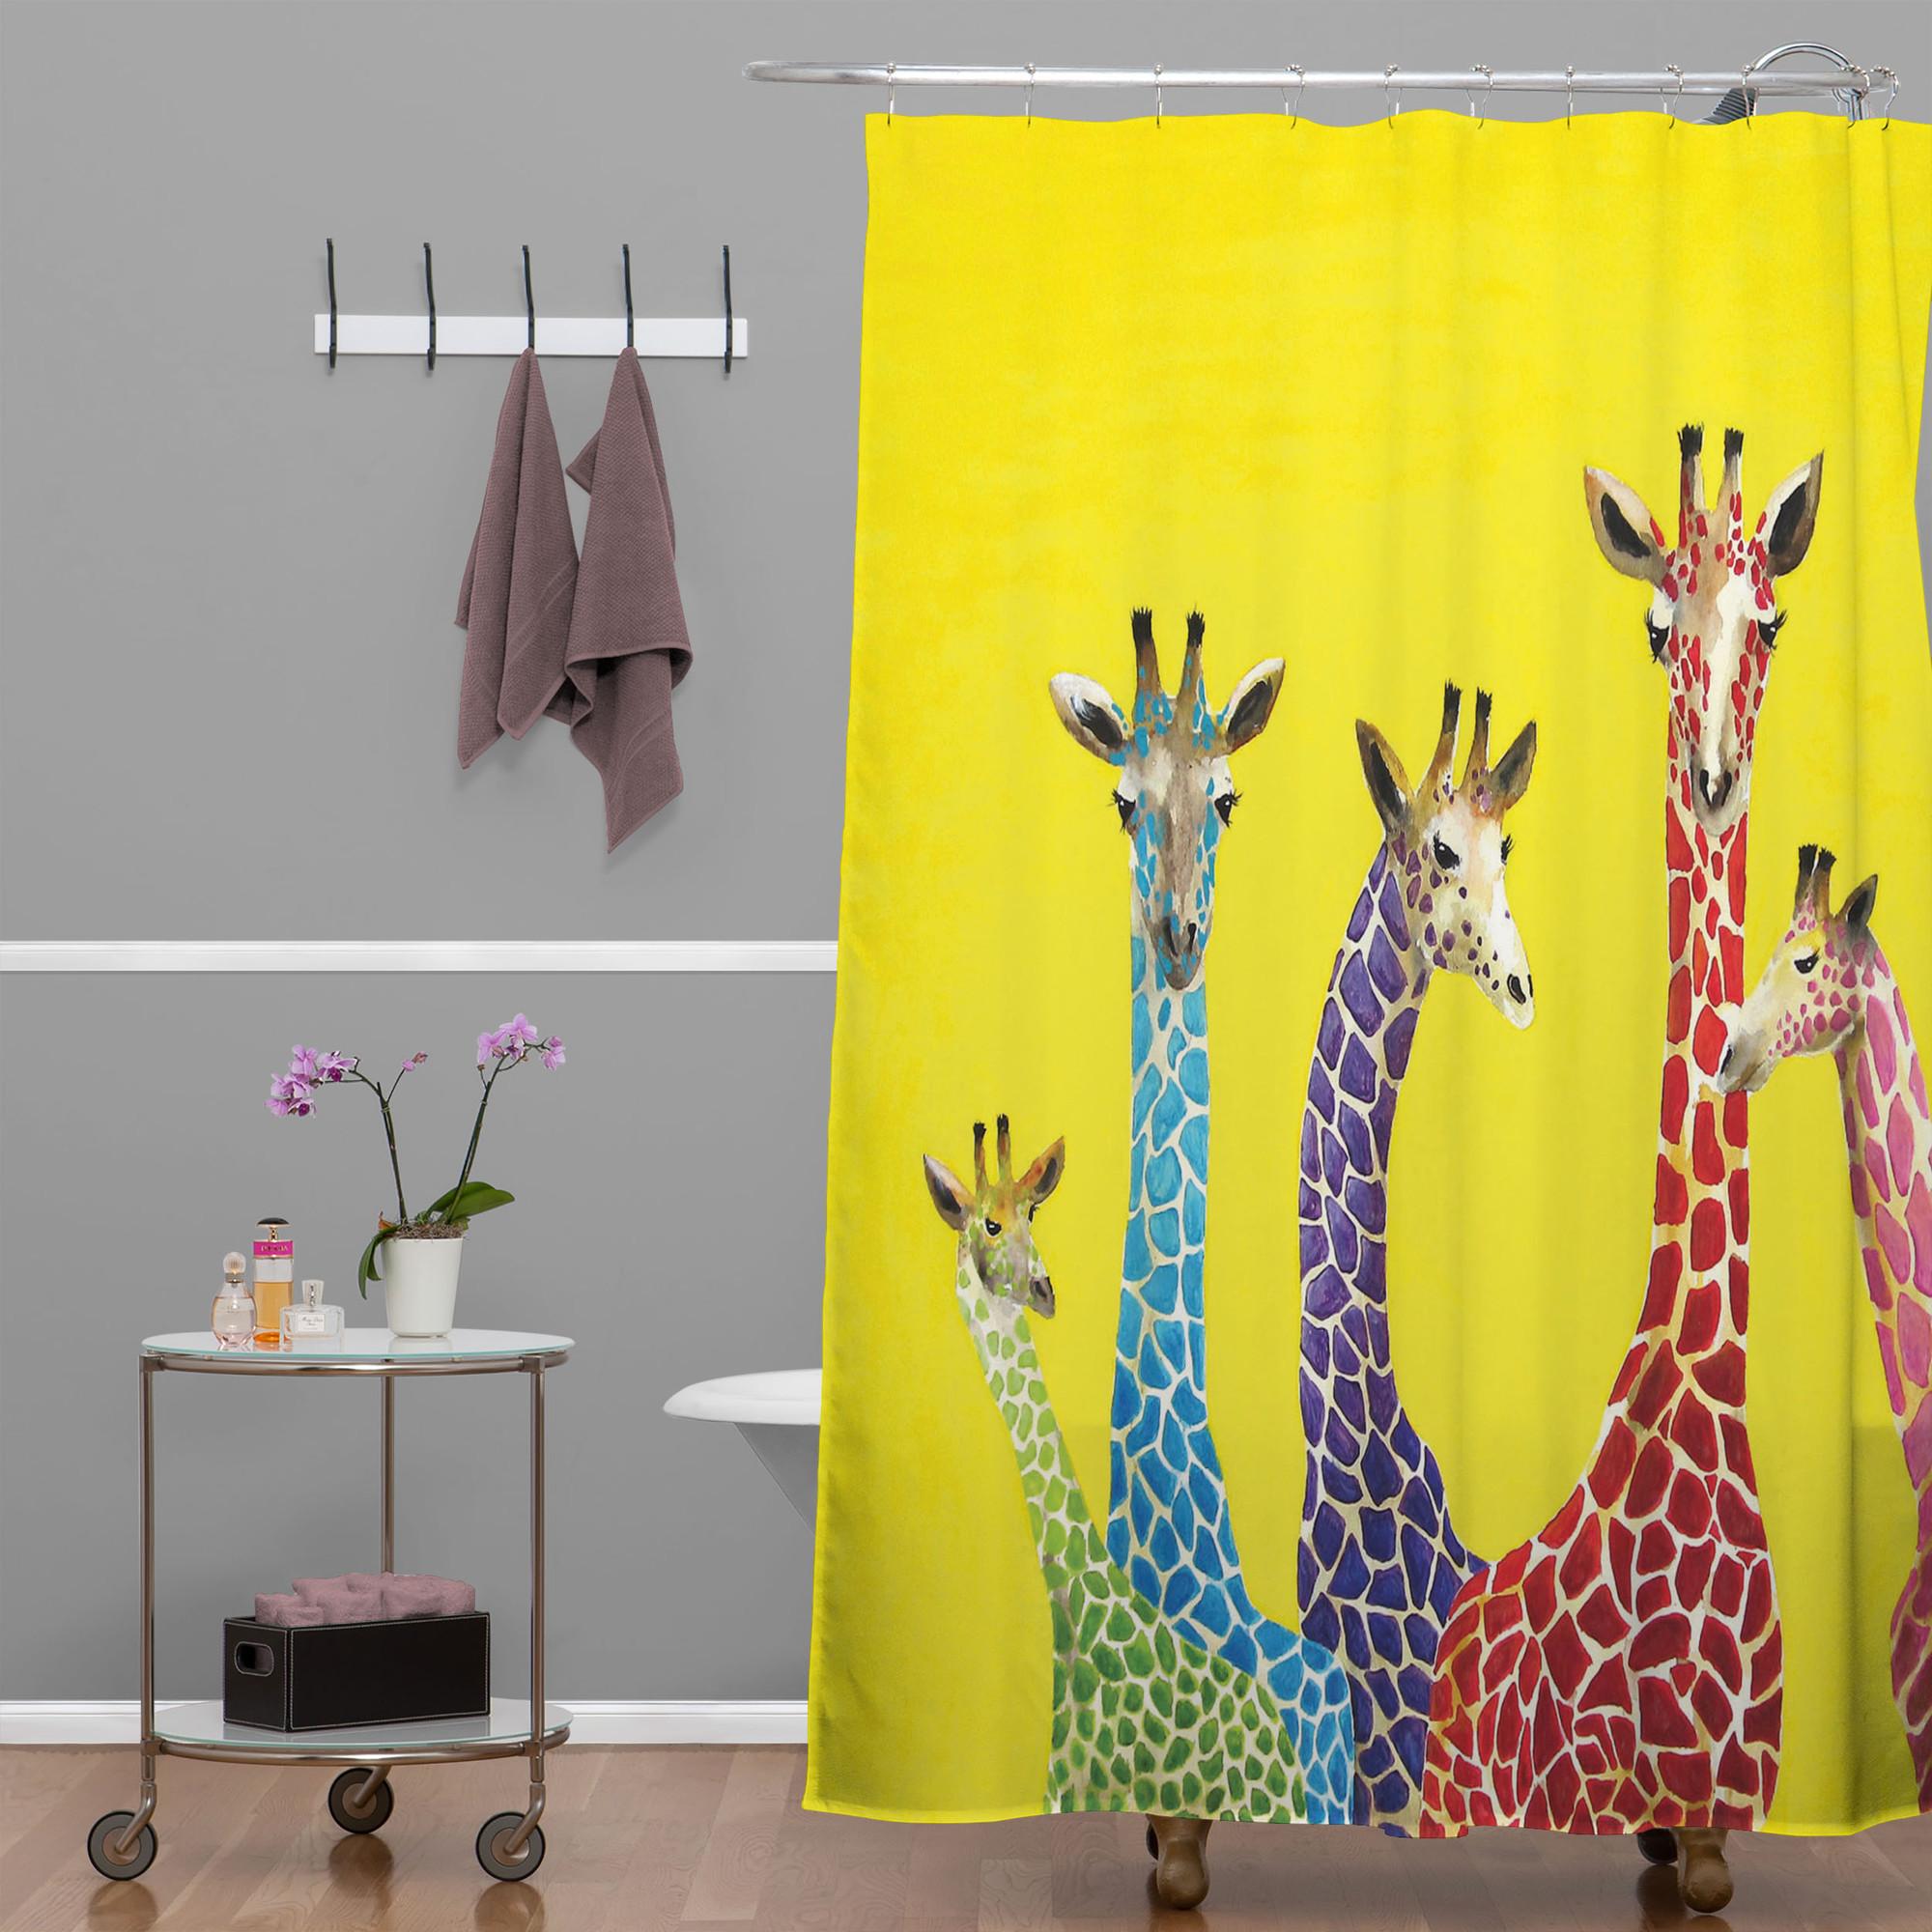 Like watching  Yellow Submarine:  Clara Nilles Jellybean Giraffes Shower Curtain for DENY Designs